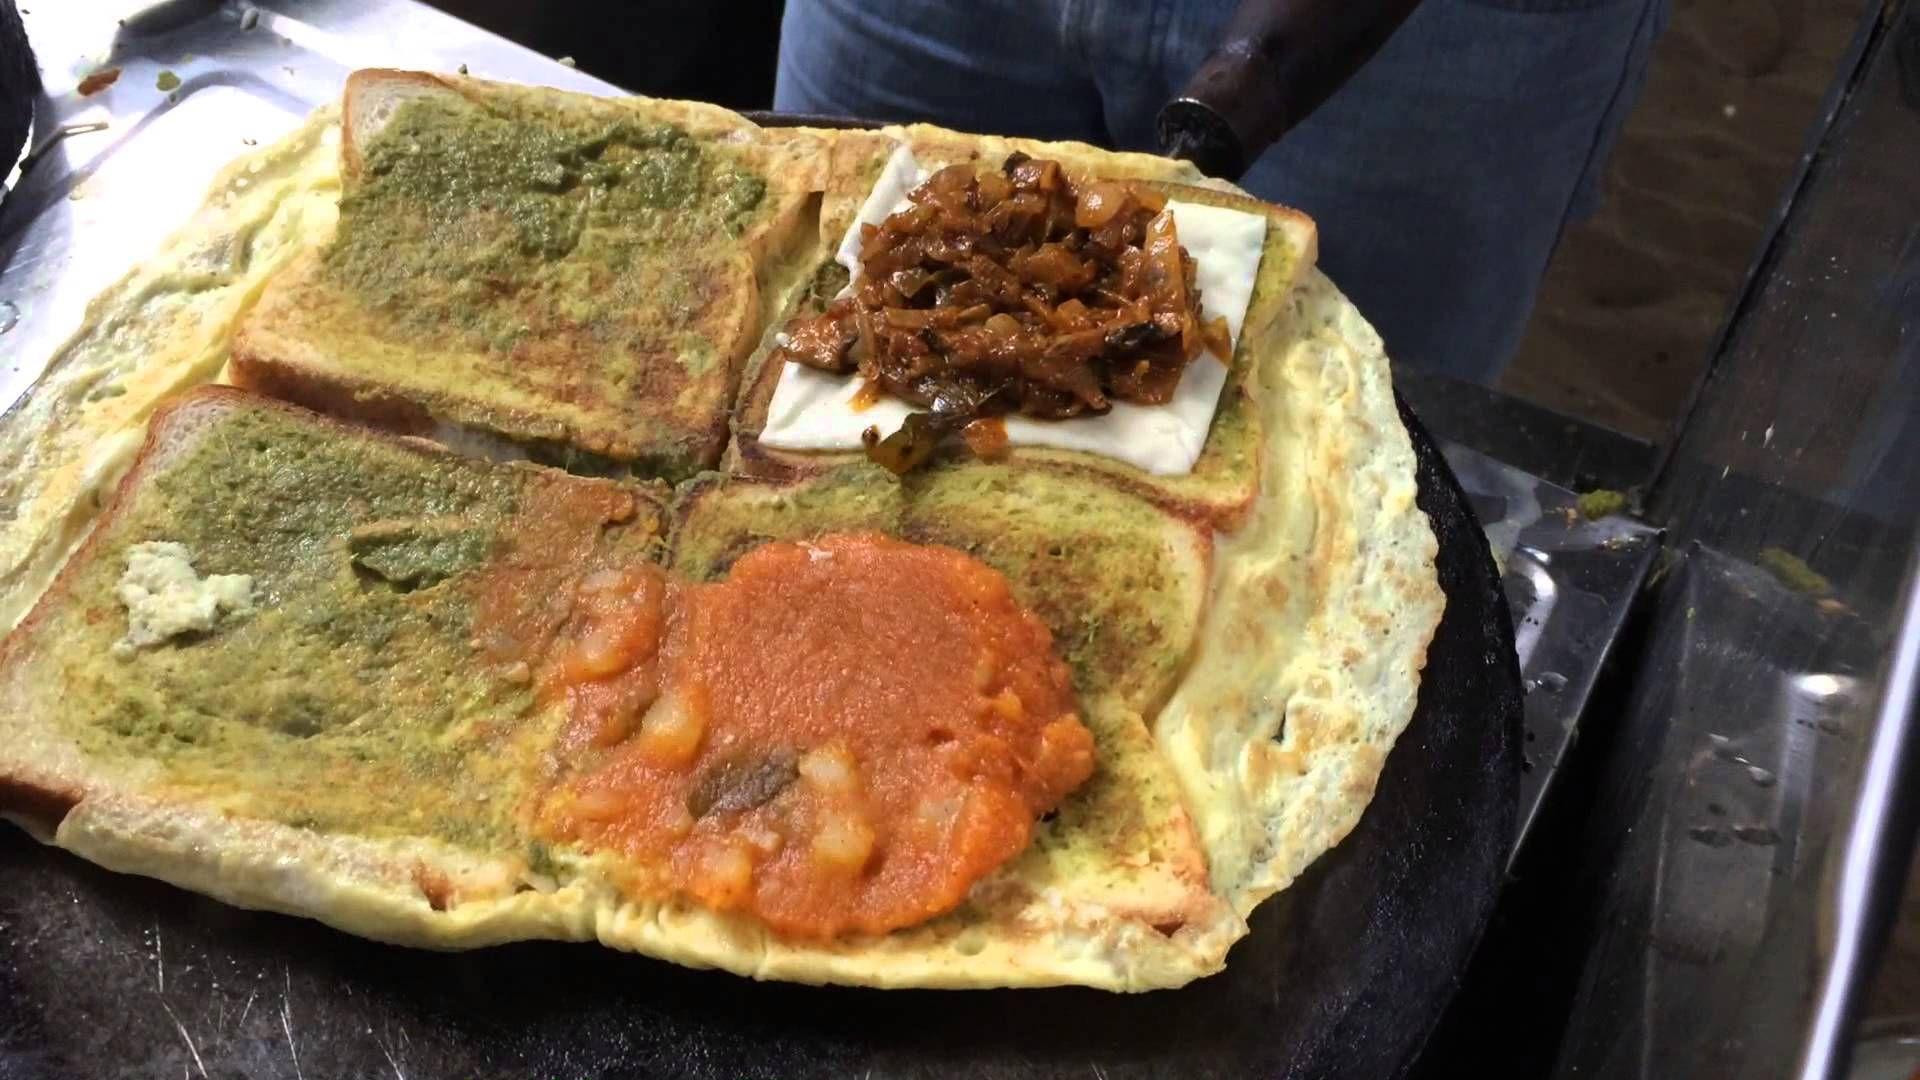 Chennai street food - King of Bread omelette - Indian Street Food